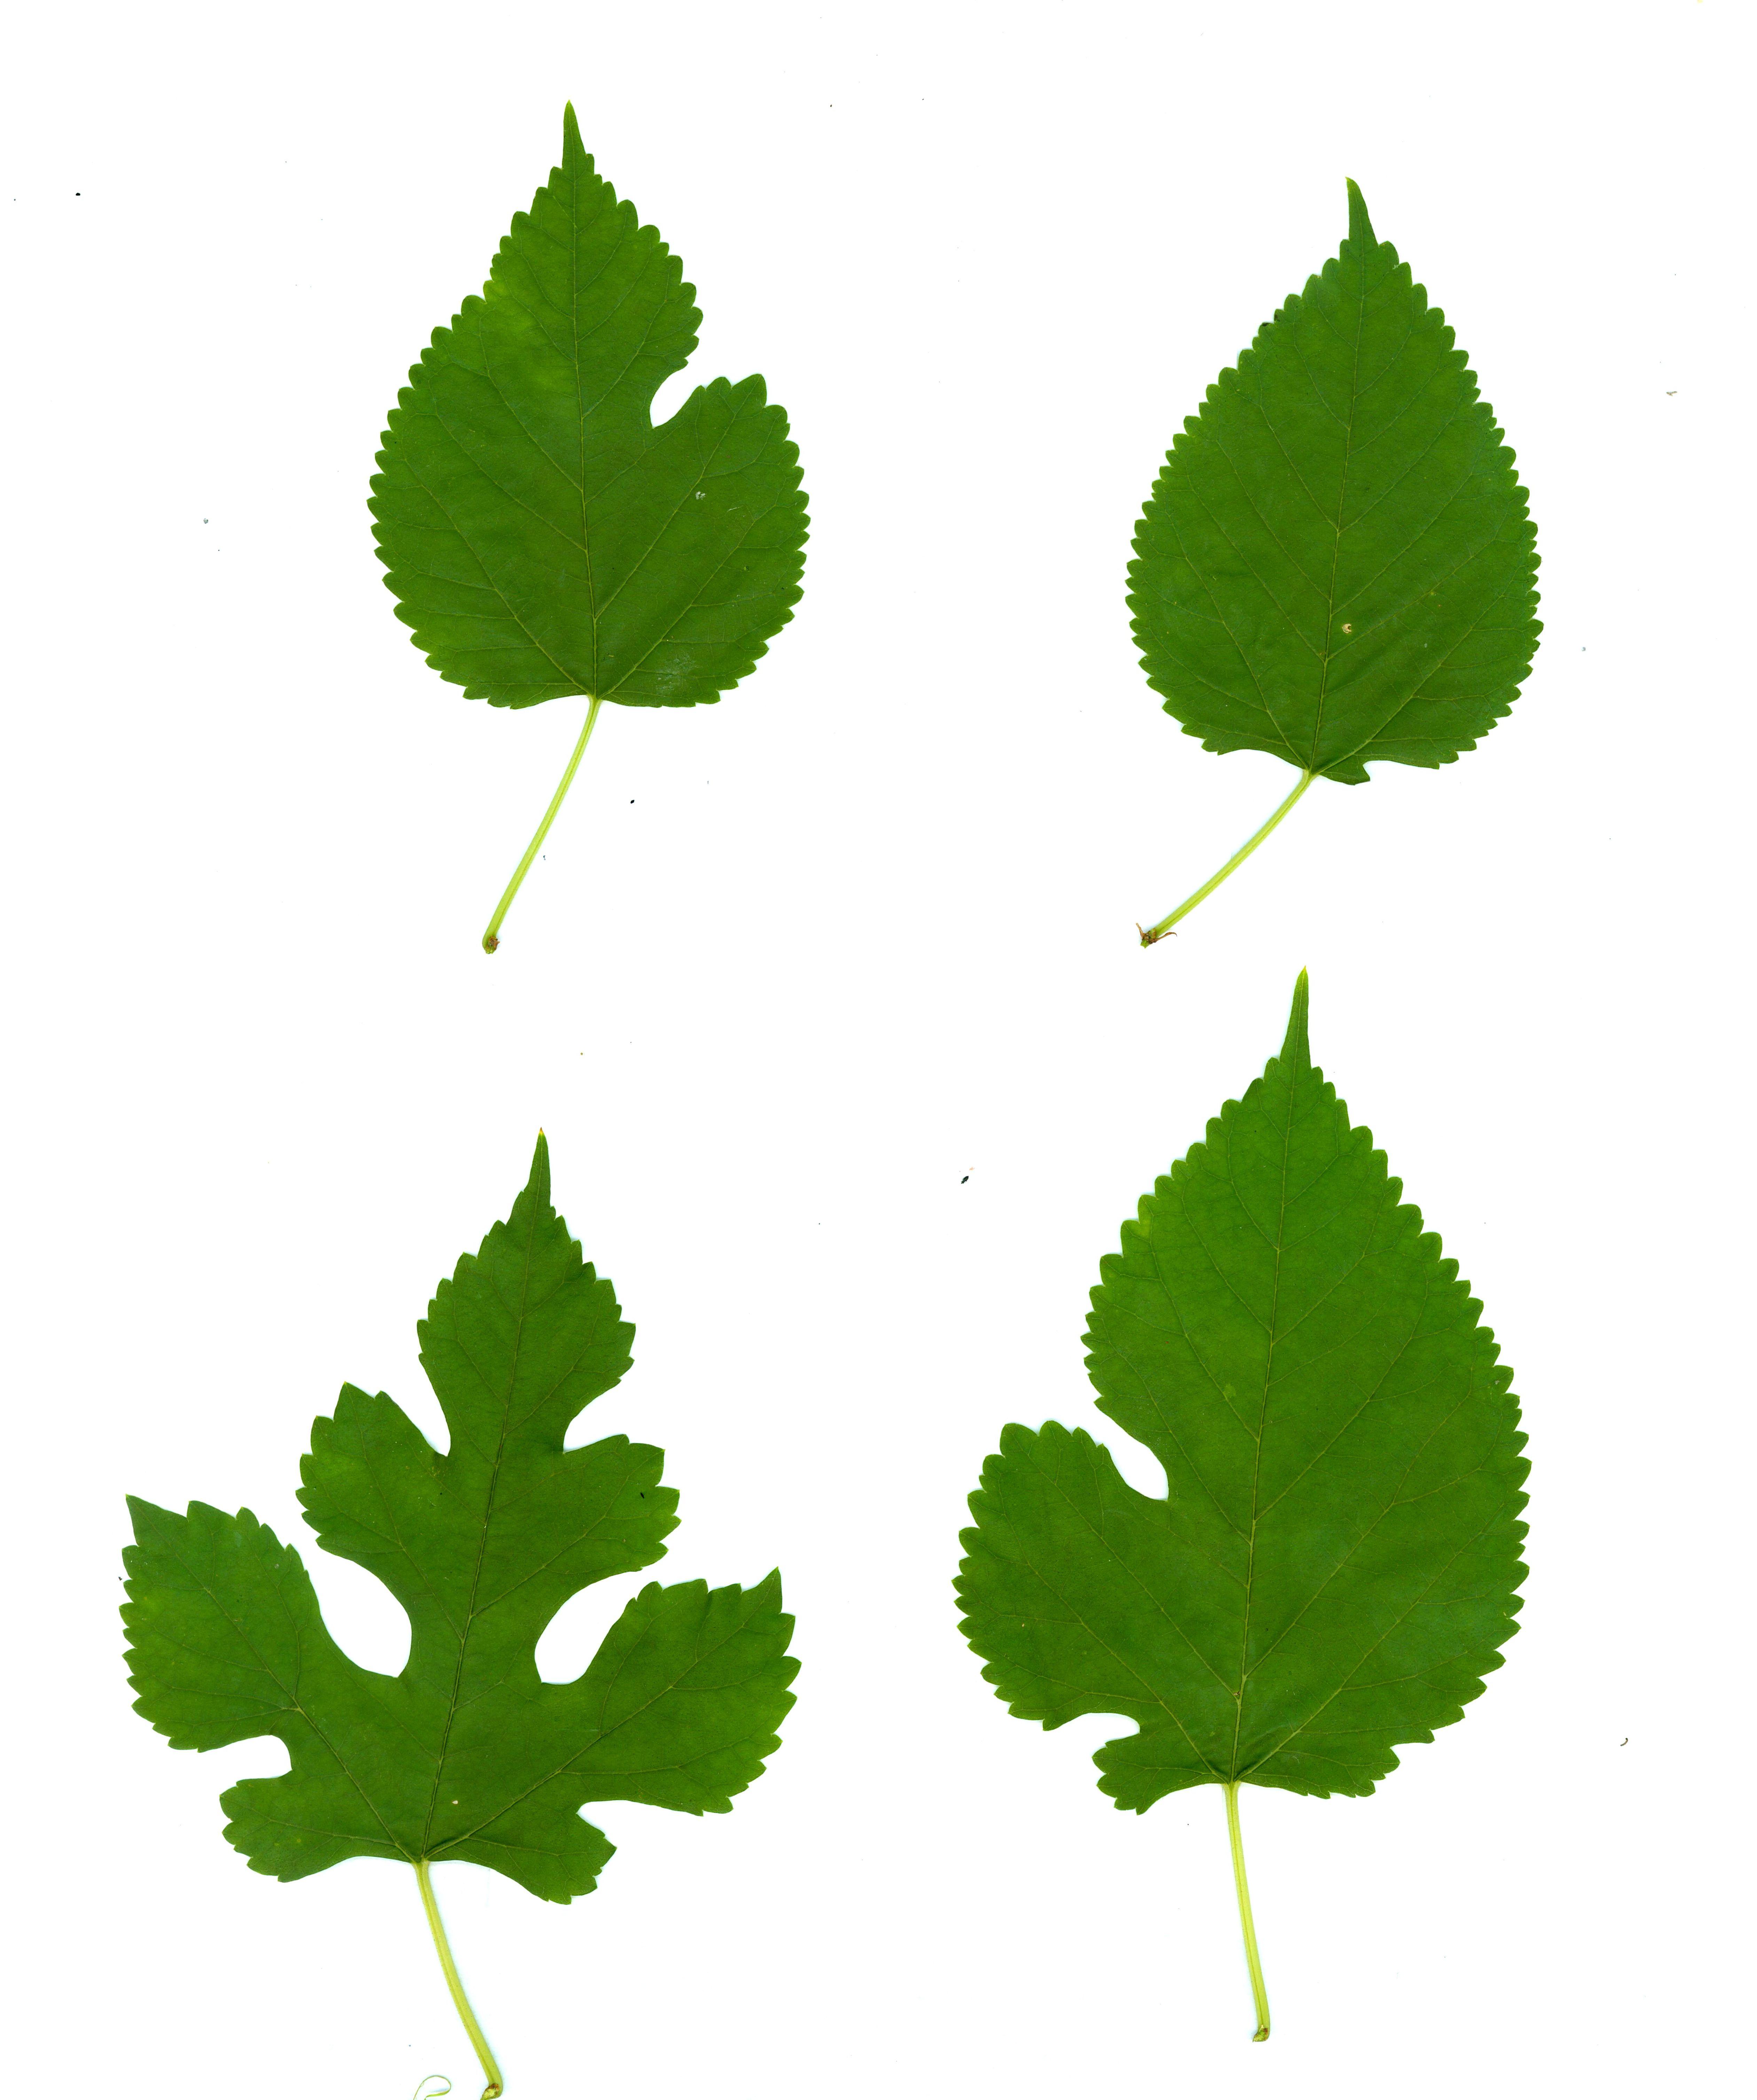 Morus Alba Leavesjpg Clipart.